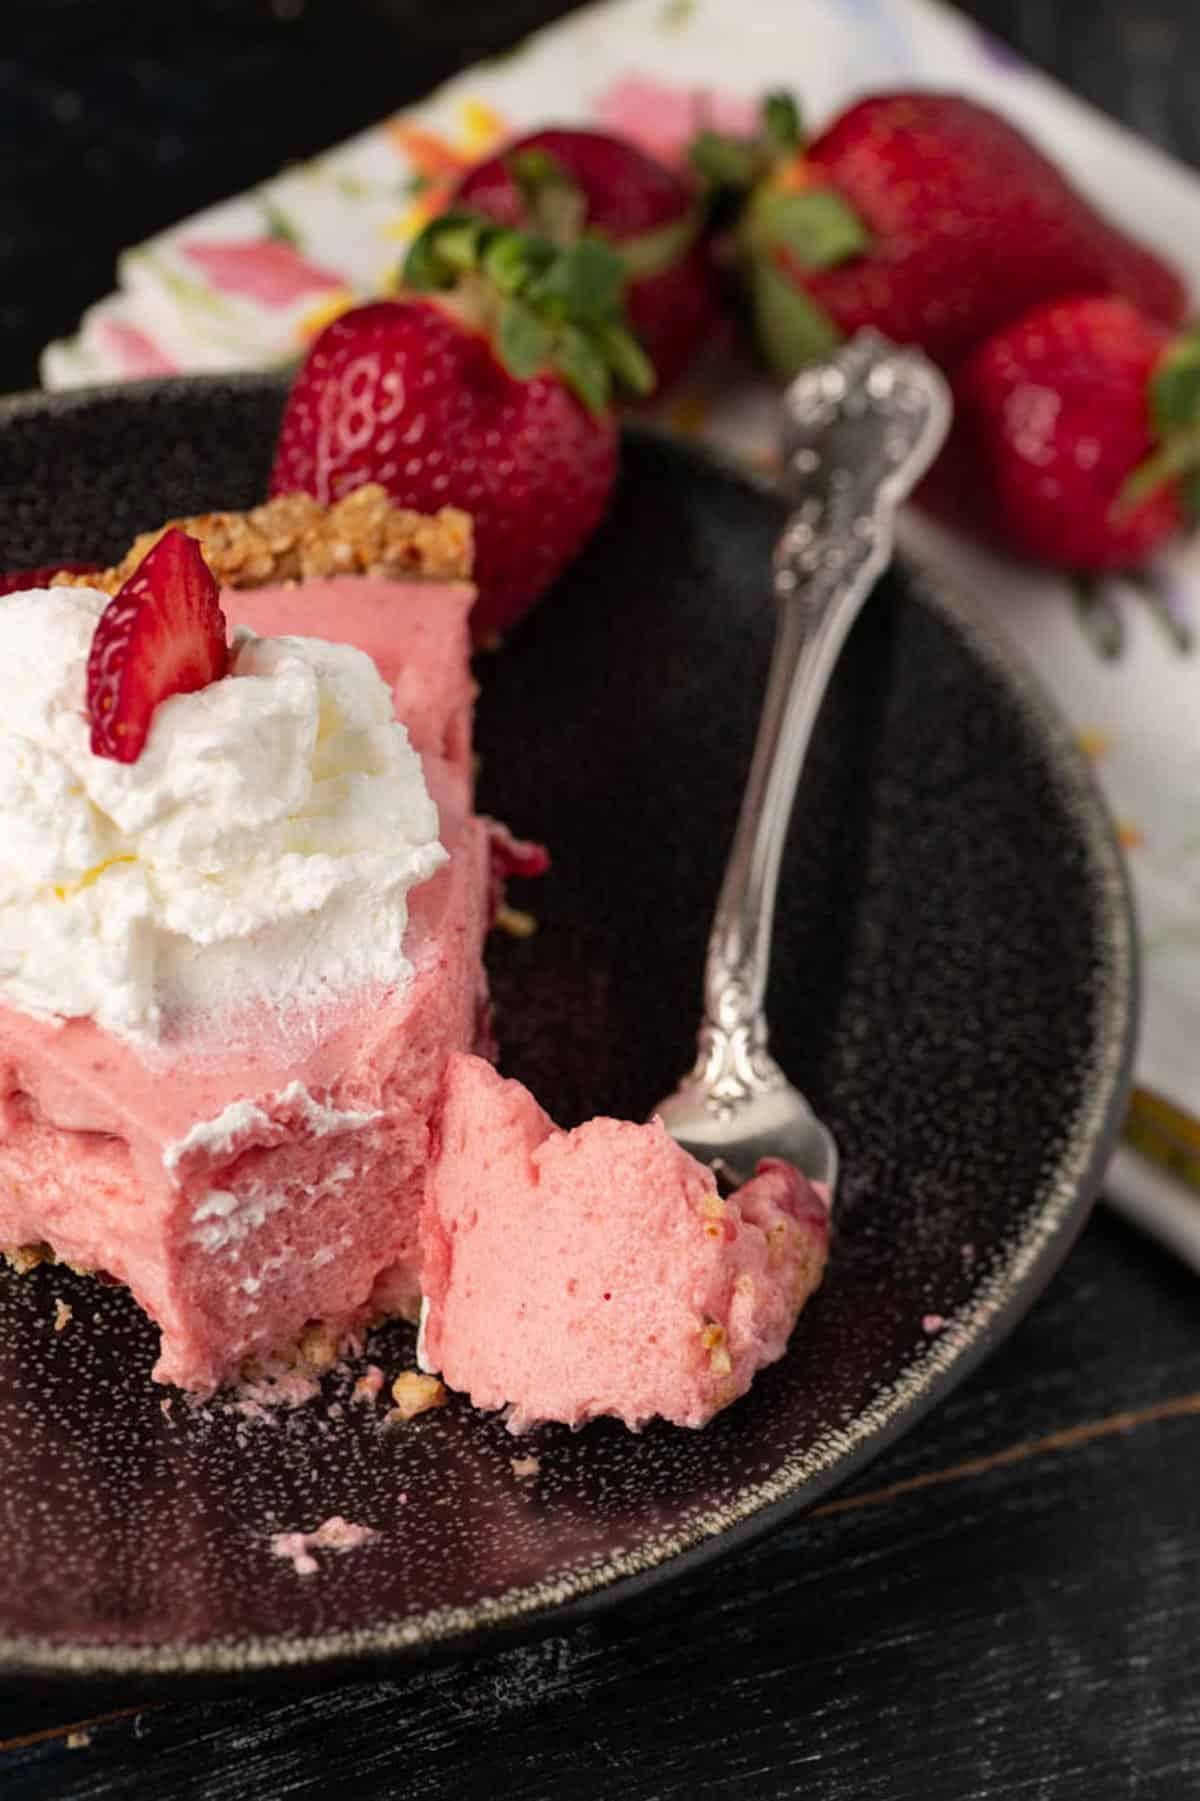 A bite on a fork of strawberry chiffon pie.